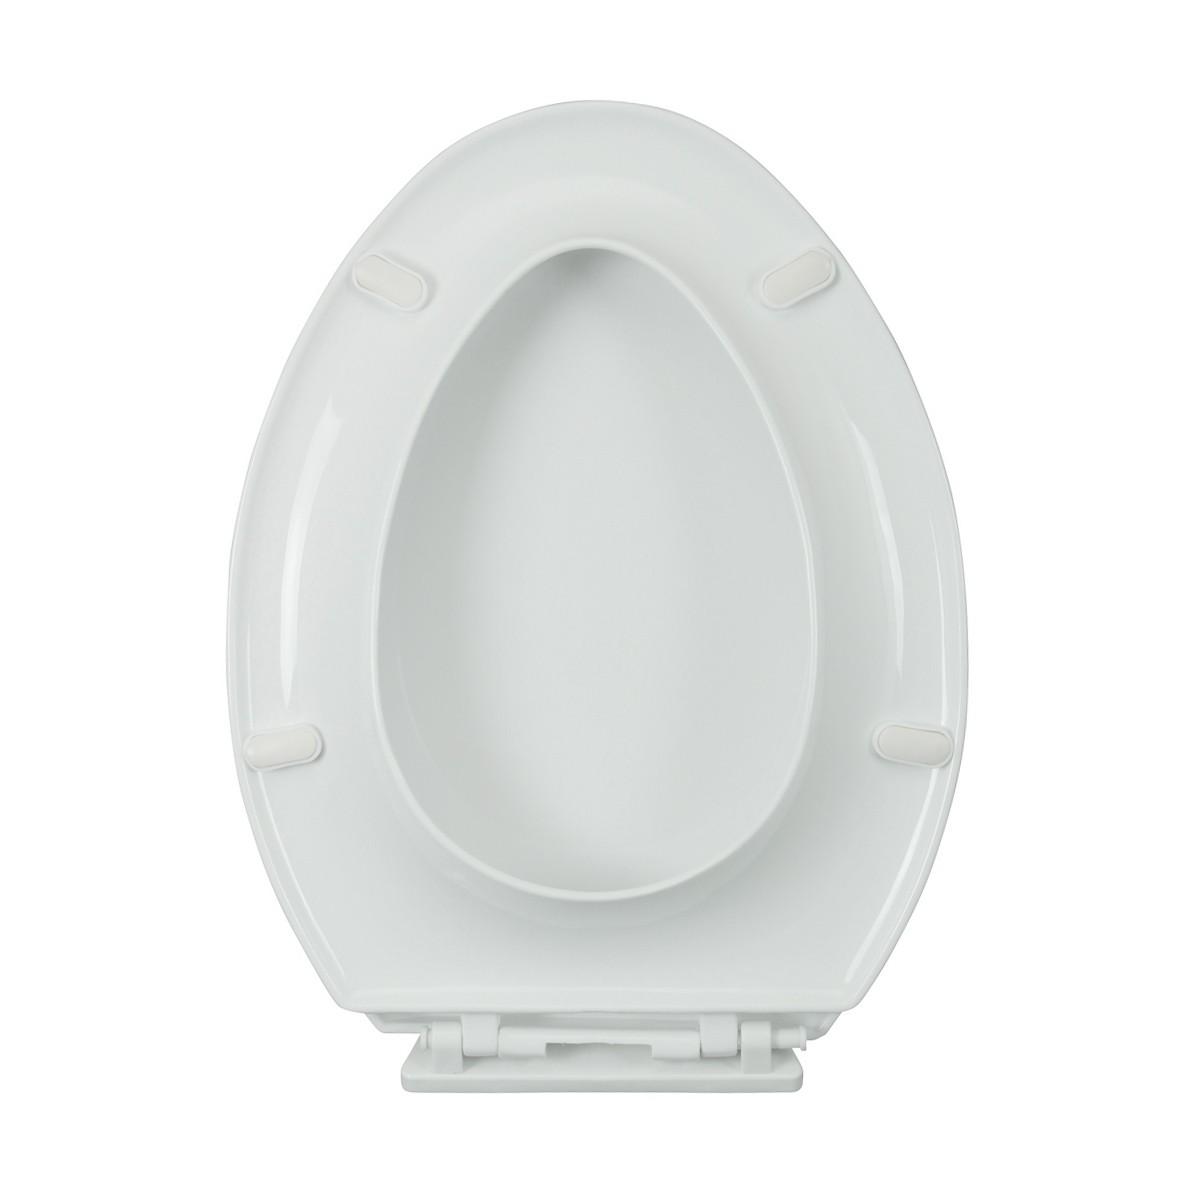 Toilet Part White Sheffield Elongated Toilet Bowl Only Elongated Toilet Bowl Toilet Bowl Only White Toilet Bowl